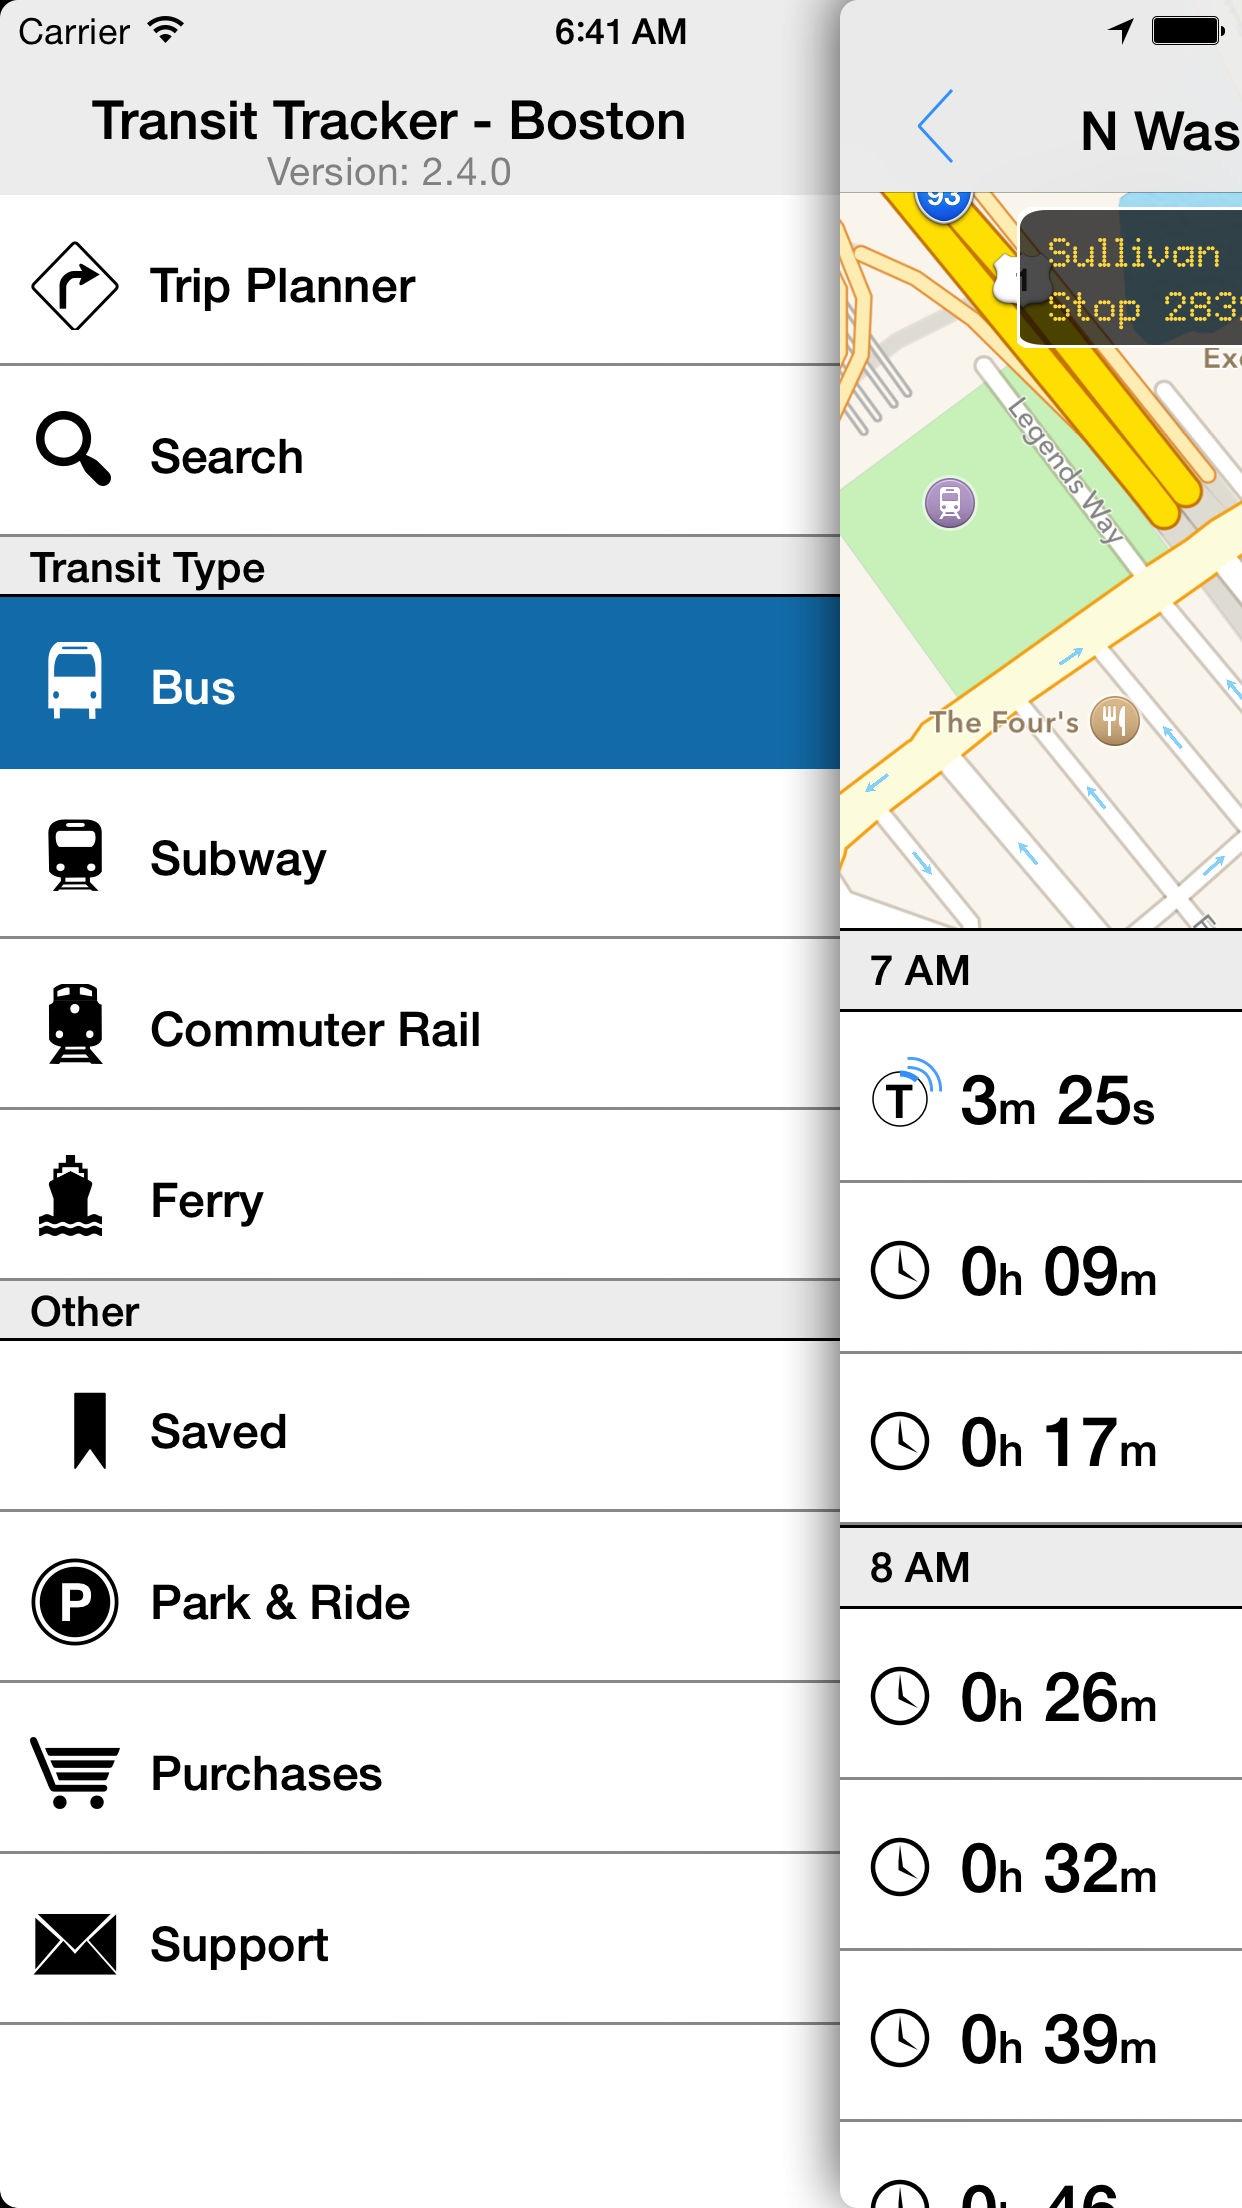 Transit Tracker - Boston (MBTA) Screenshot